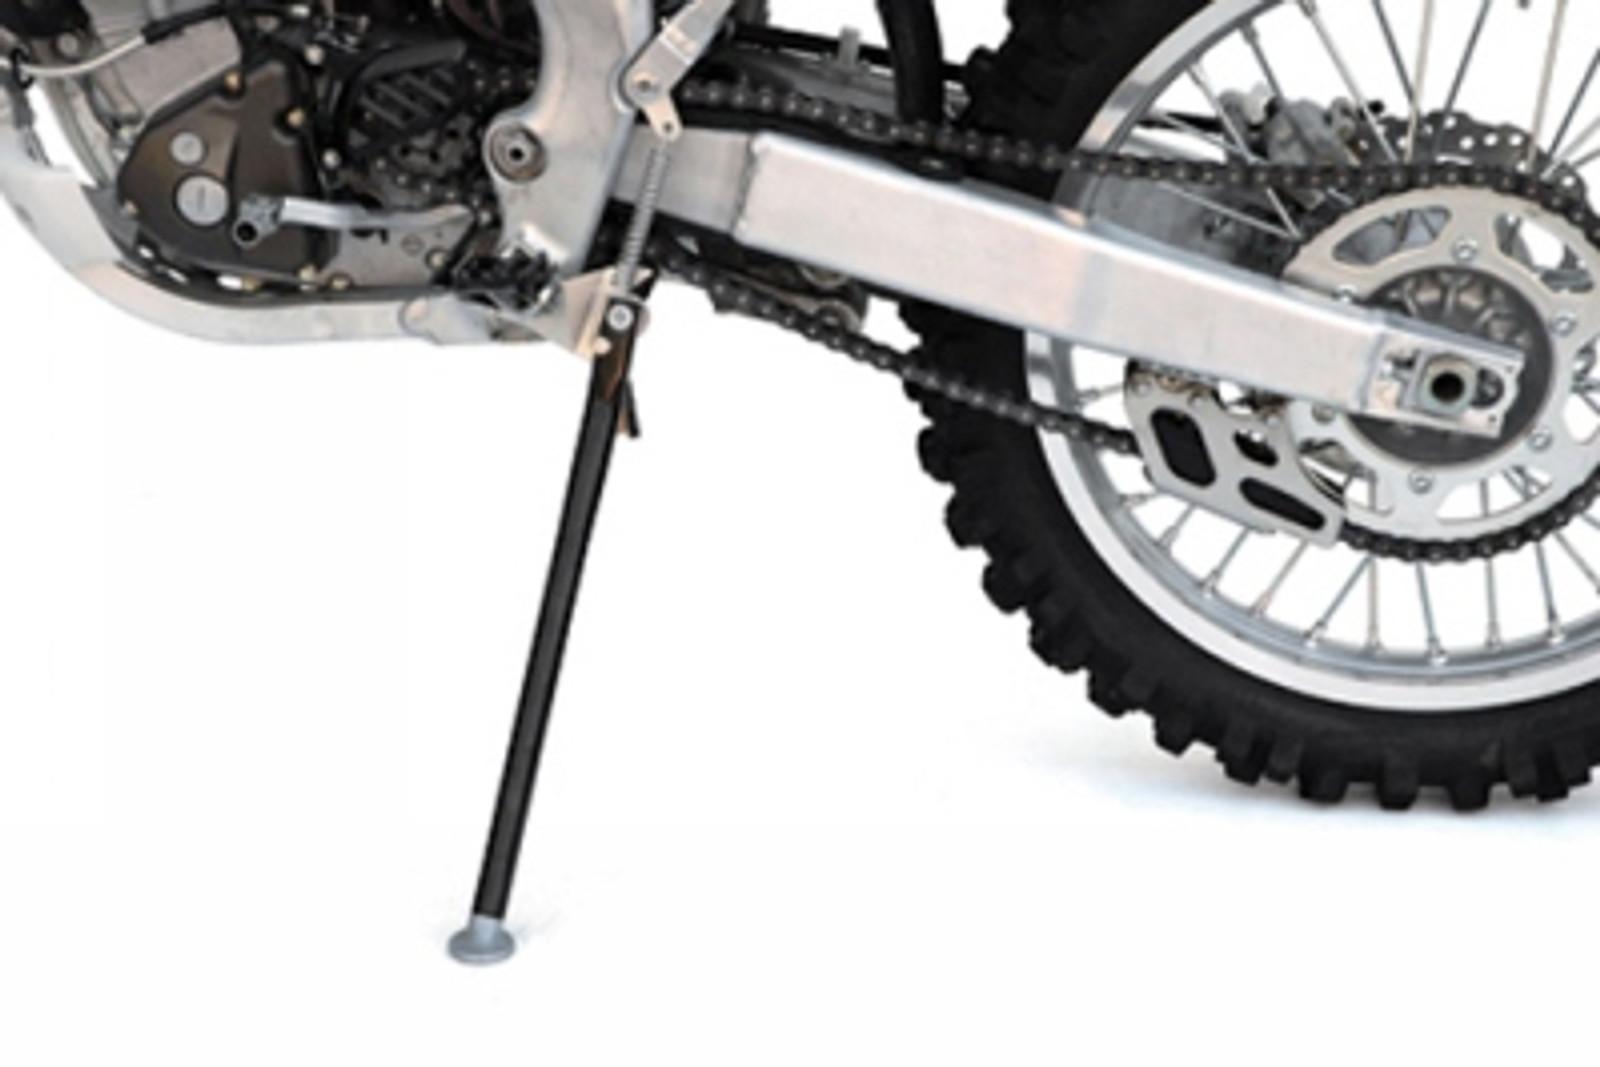 Trail Tech 5203-00 Kickstand Automotive Parts prb.org.af